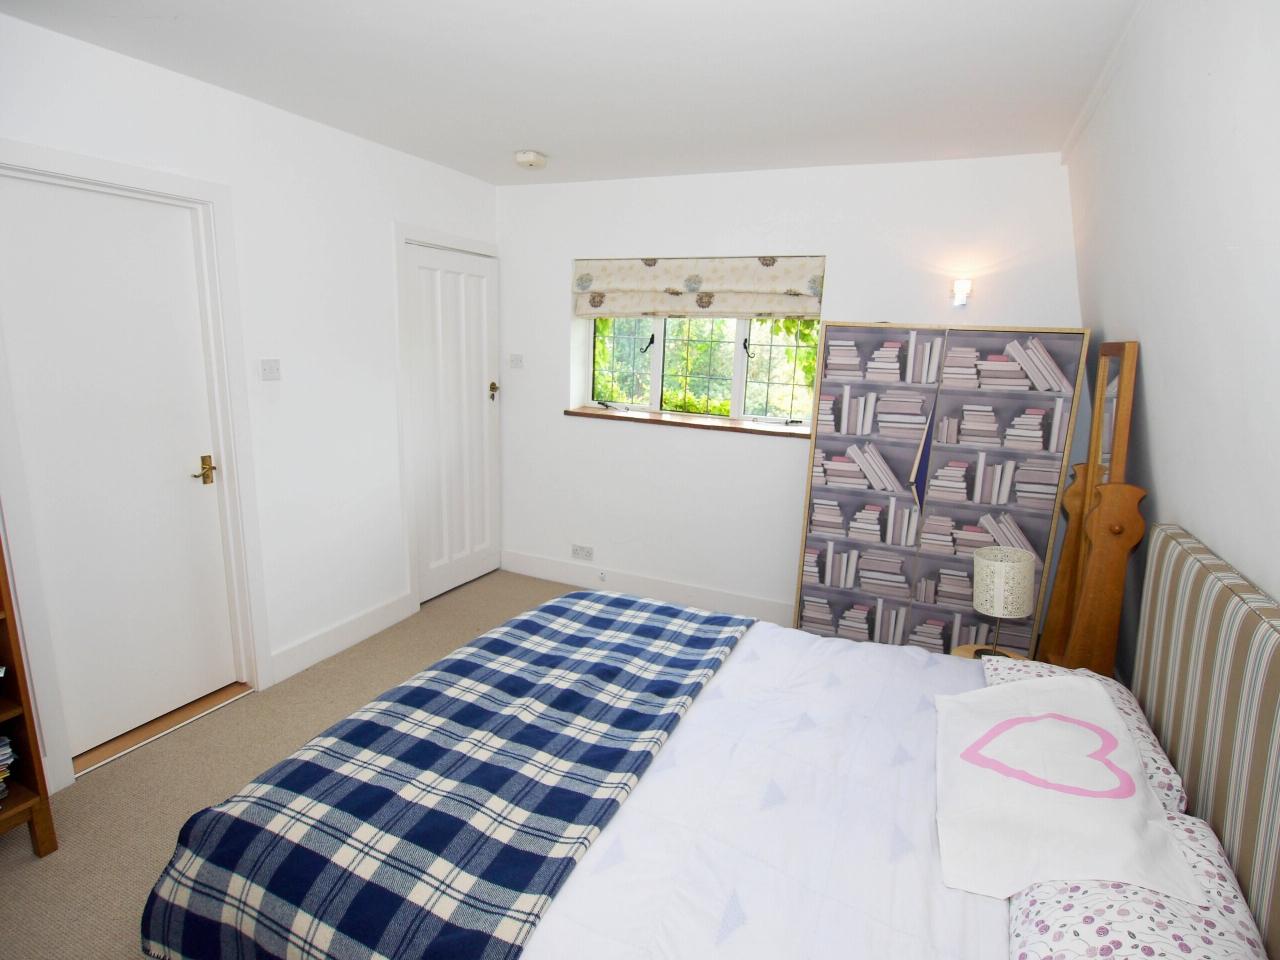 6 bedroom detached house Sold in Sevenoaks - Photograph 9